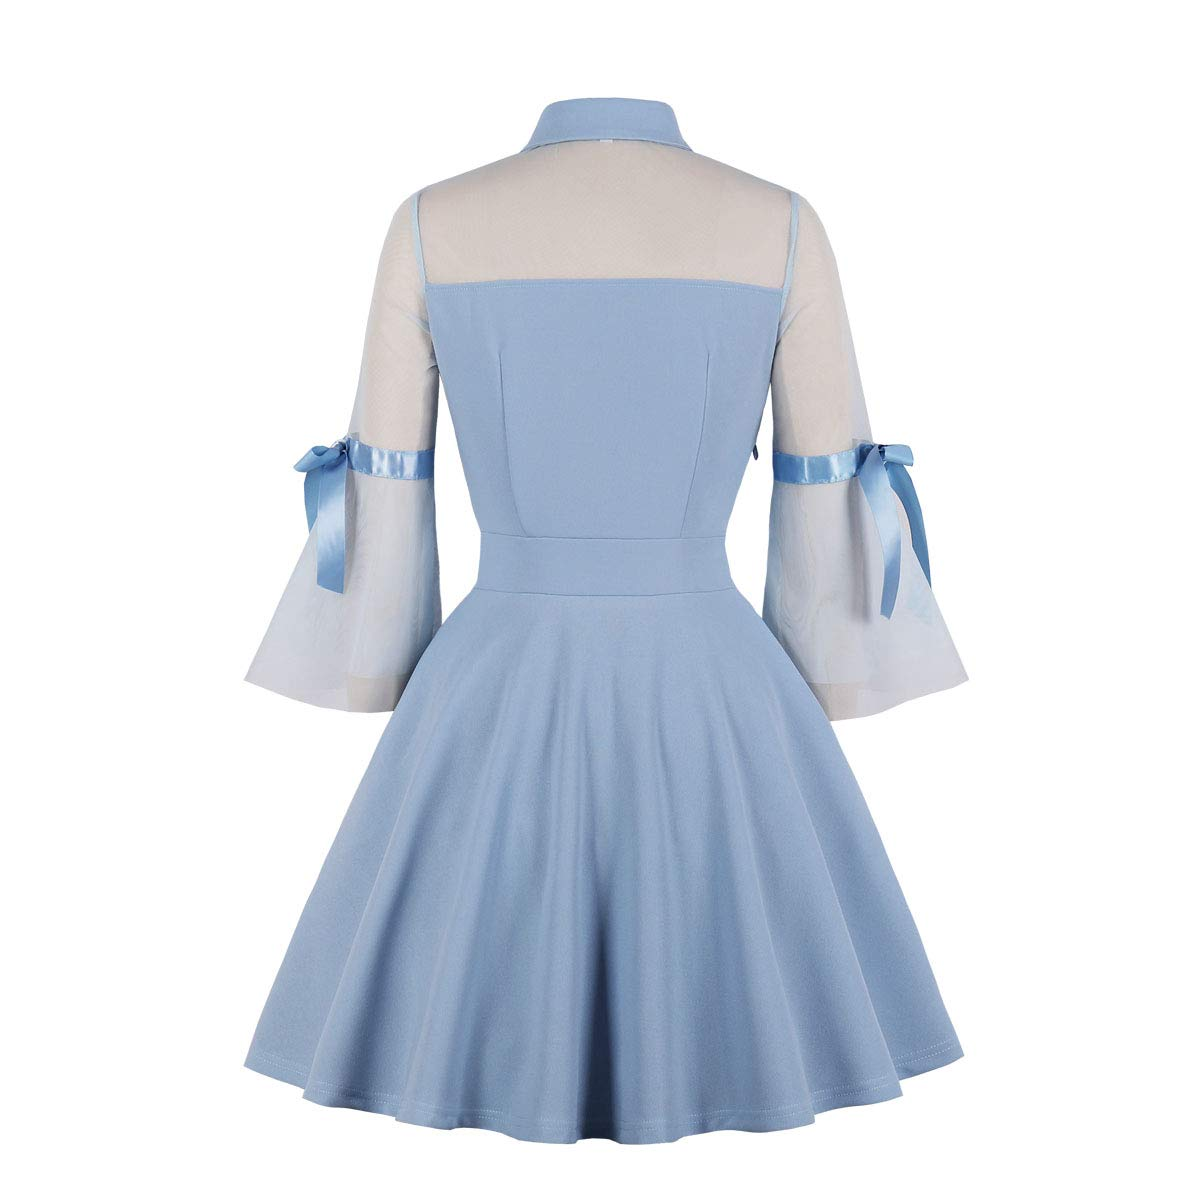 Wellwits Womens Keyhole Mesh Bell Sleeve Knee Swing Cocktail Dress